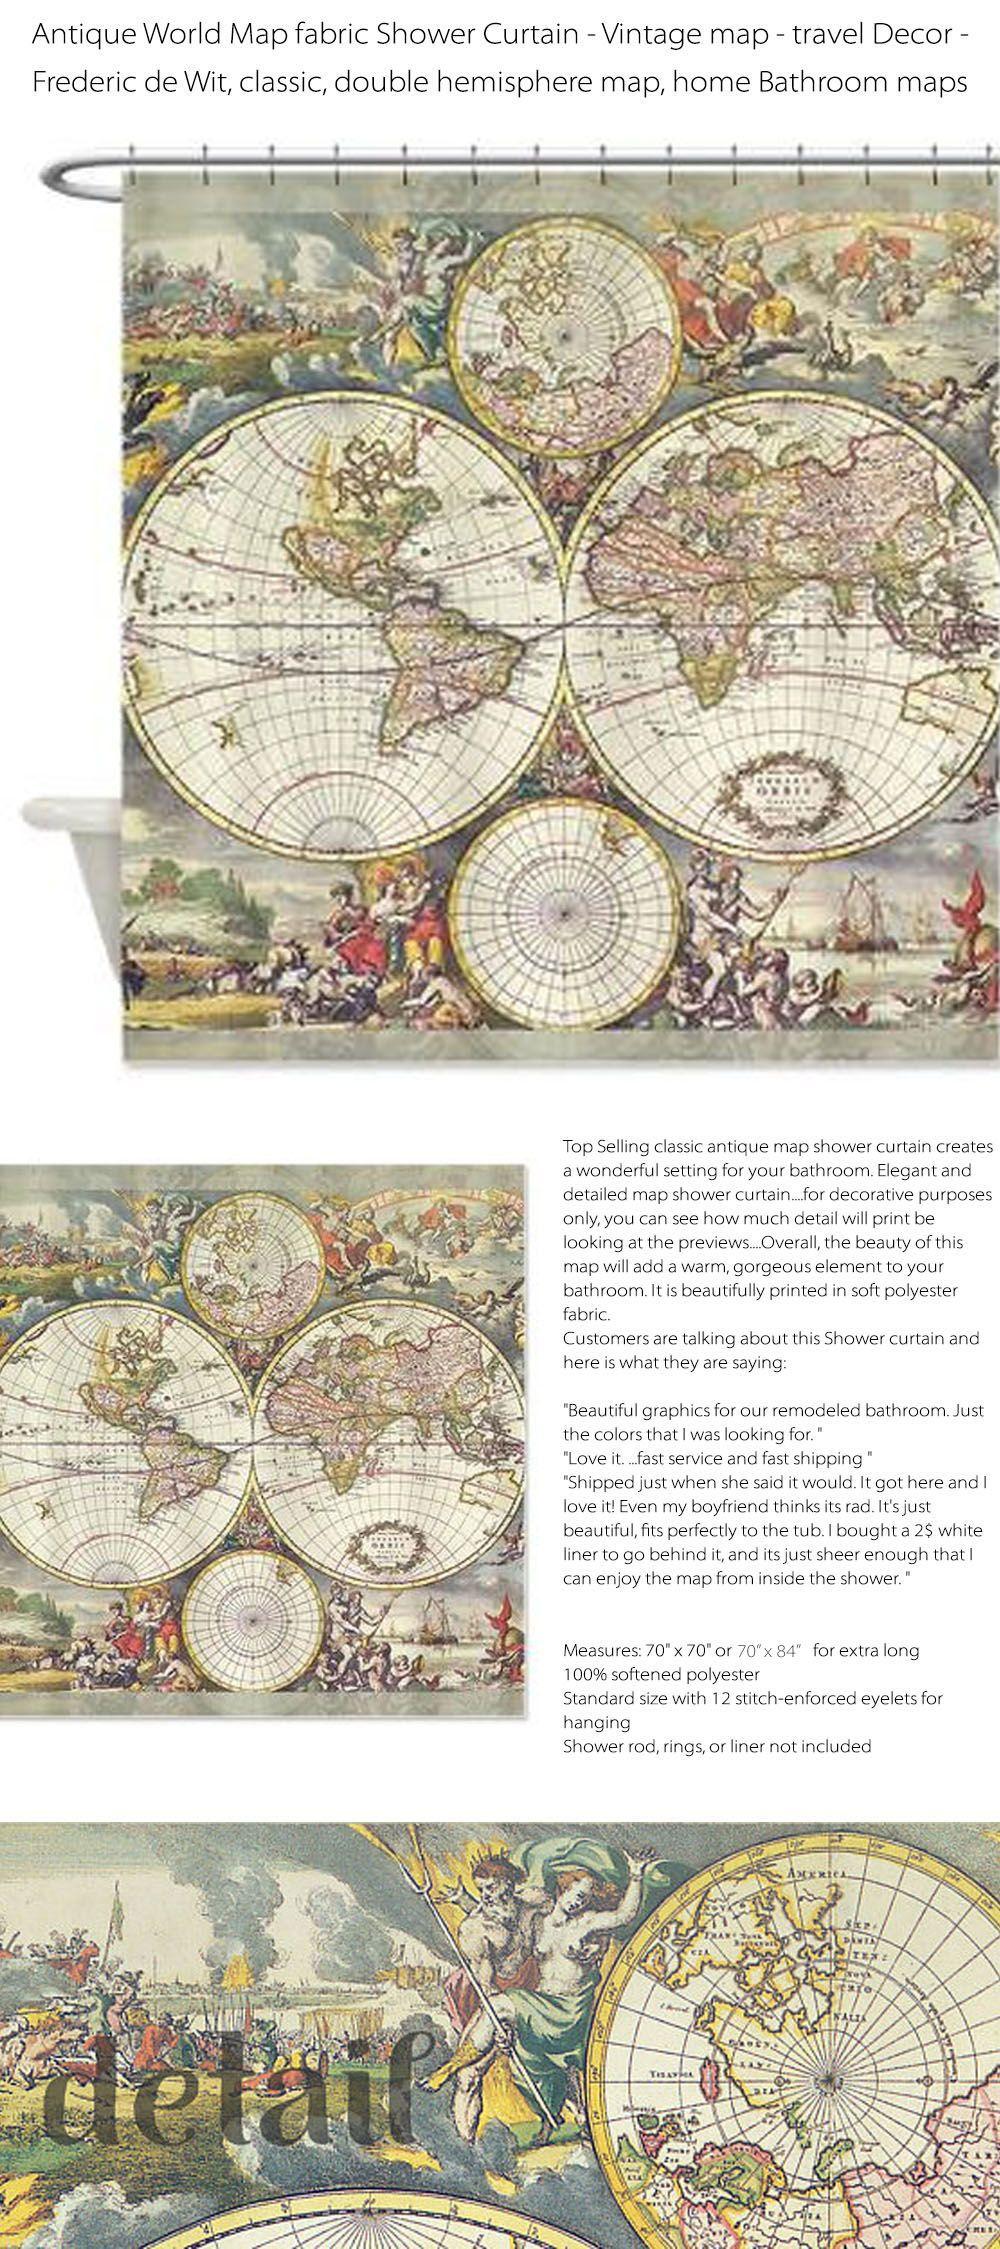 Four Hemisphere World Map Shower Curtain Frederick De Wit